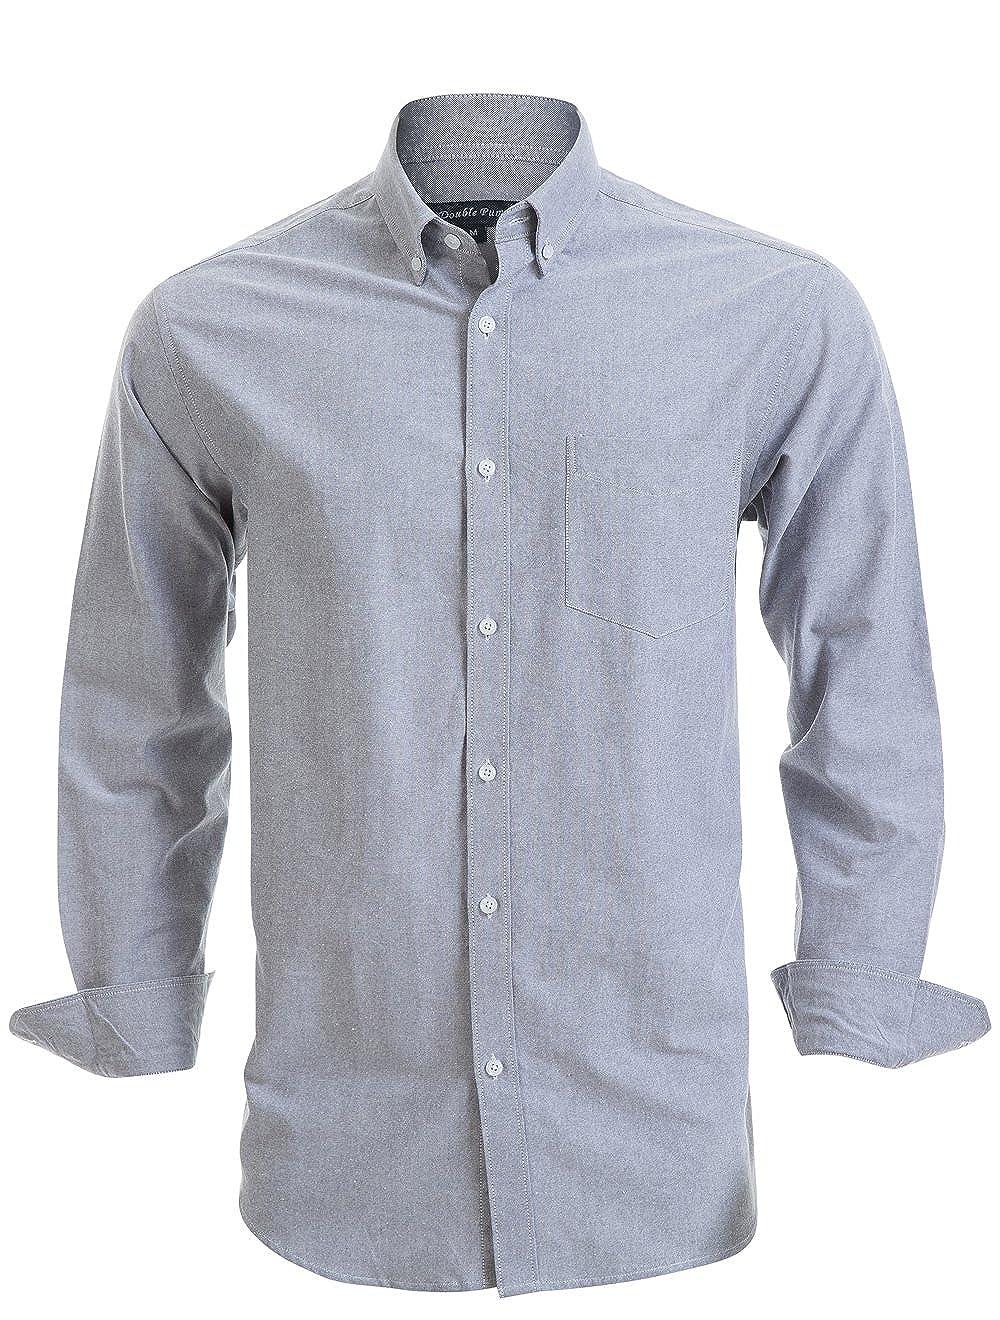 Double Pump Mens Button Down Shirts 100/% Cotton Long Sleeve Shirts Regular Fit